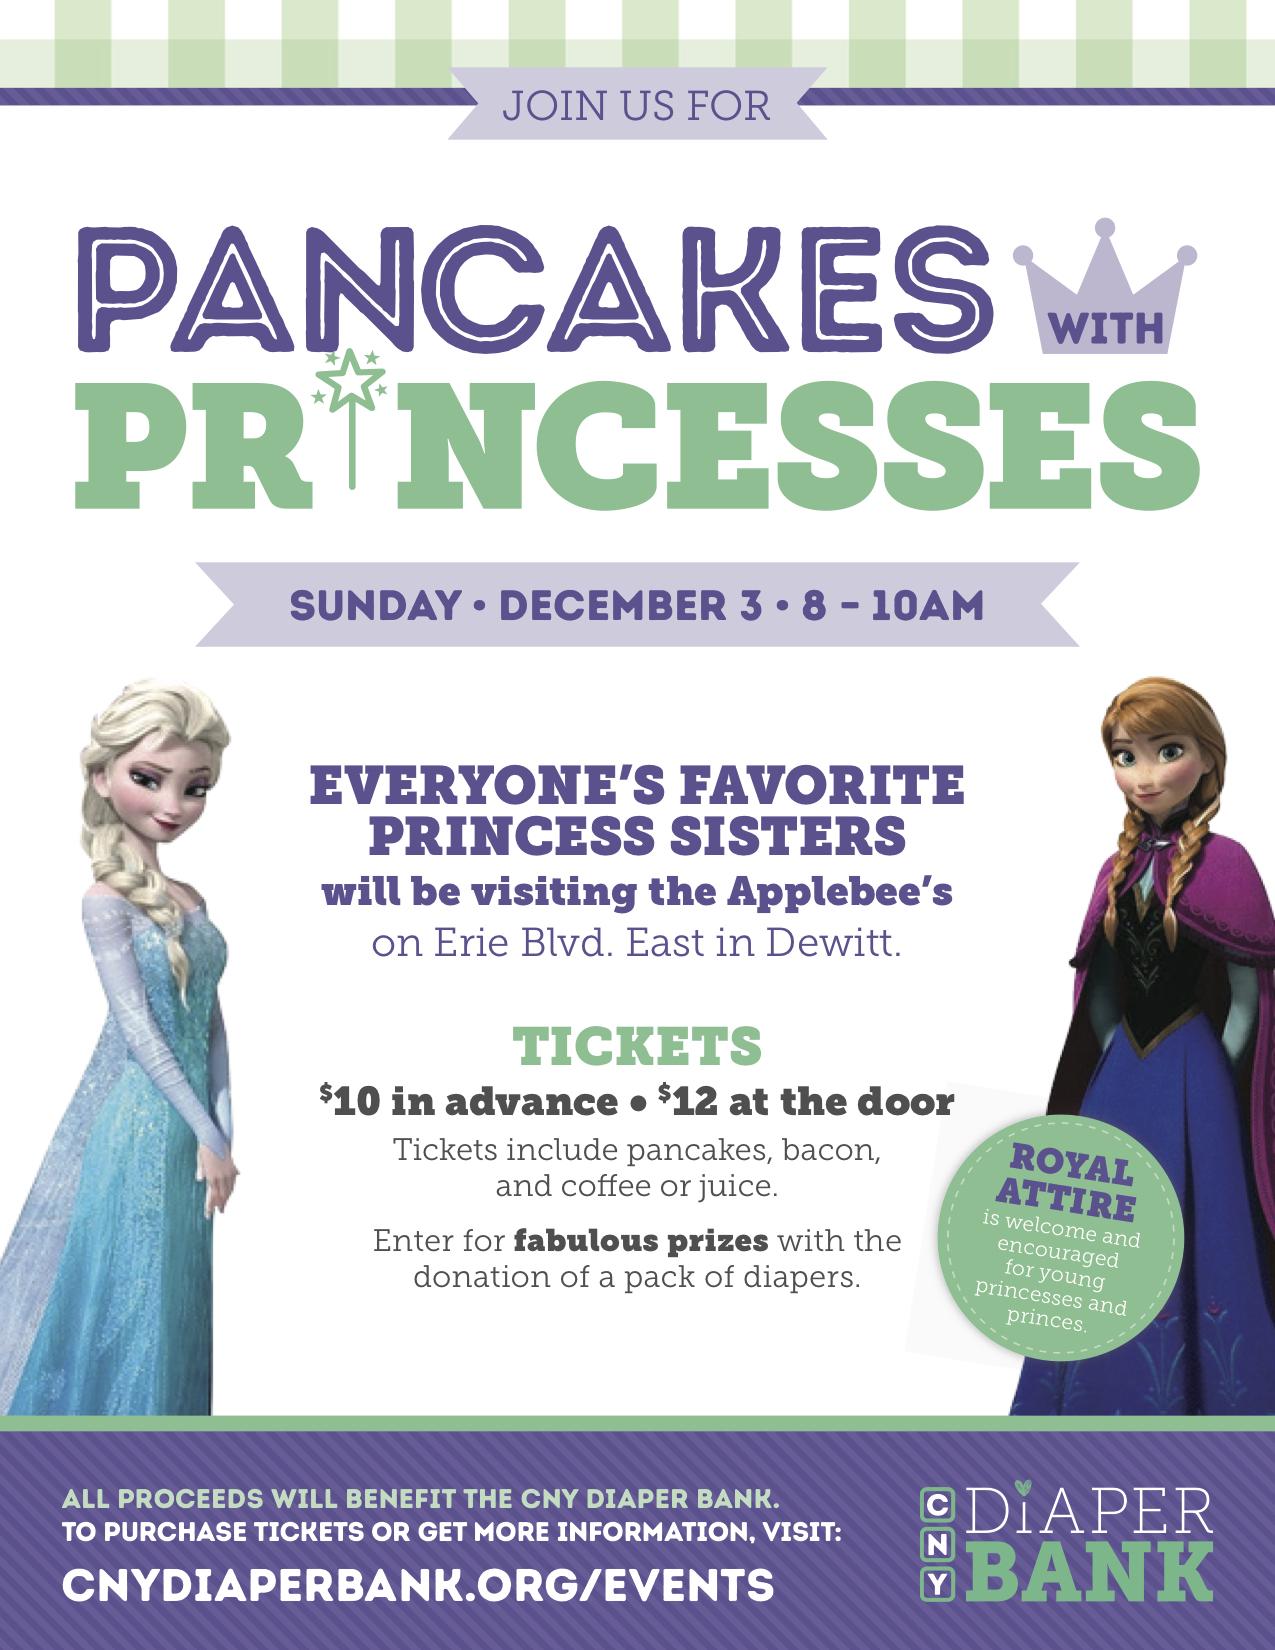 CNY Diaper Bank Pancakes with Princesses Flyer REV.jpg